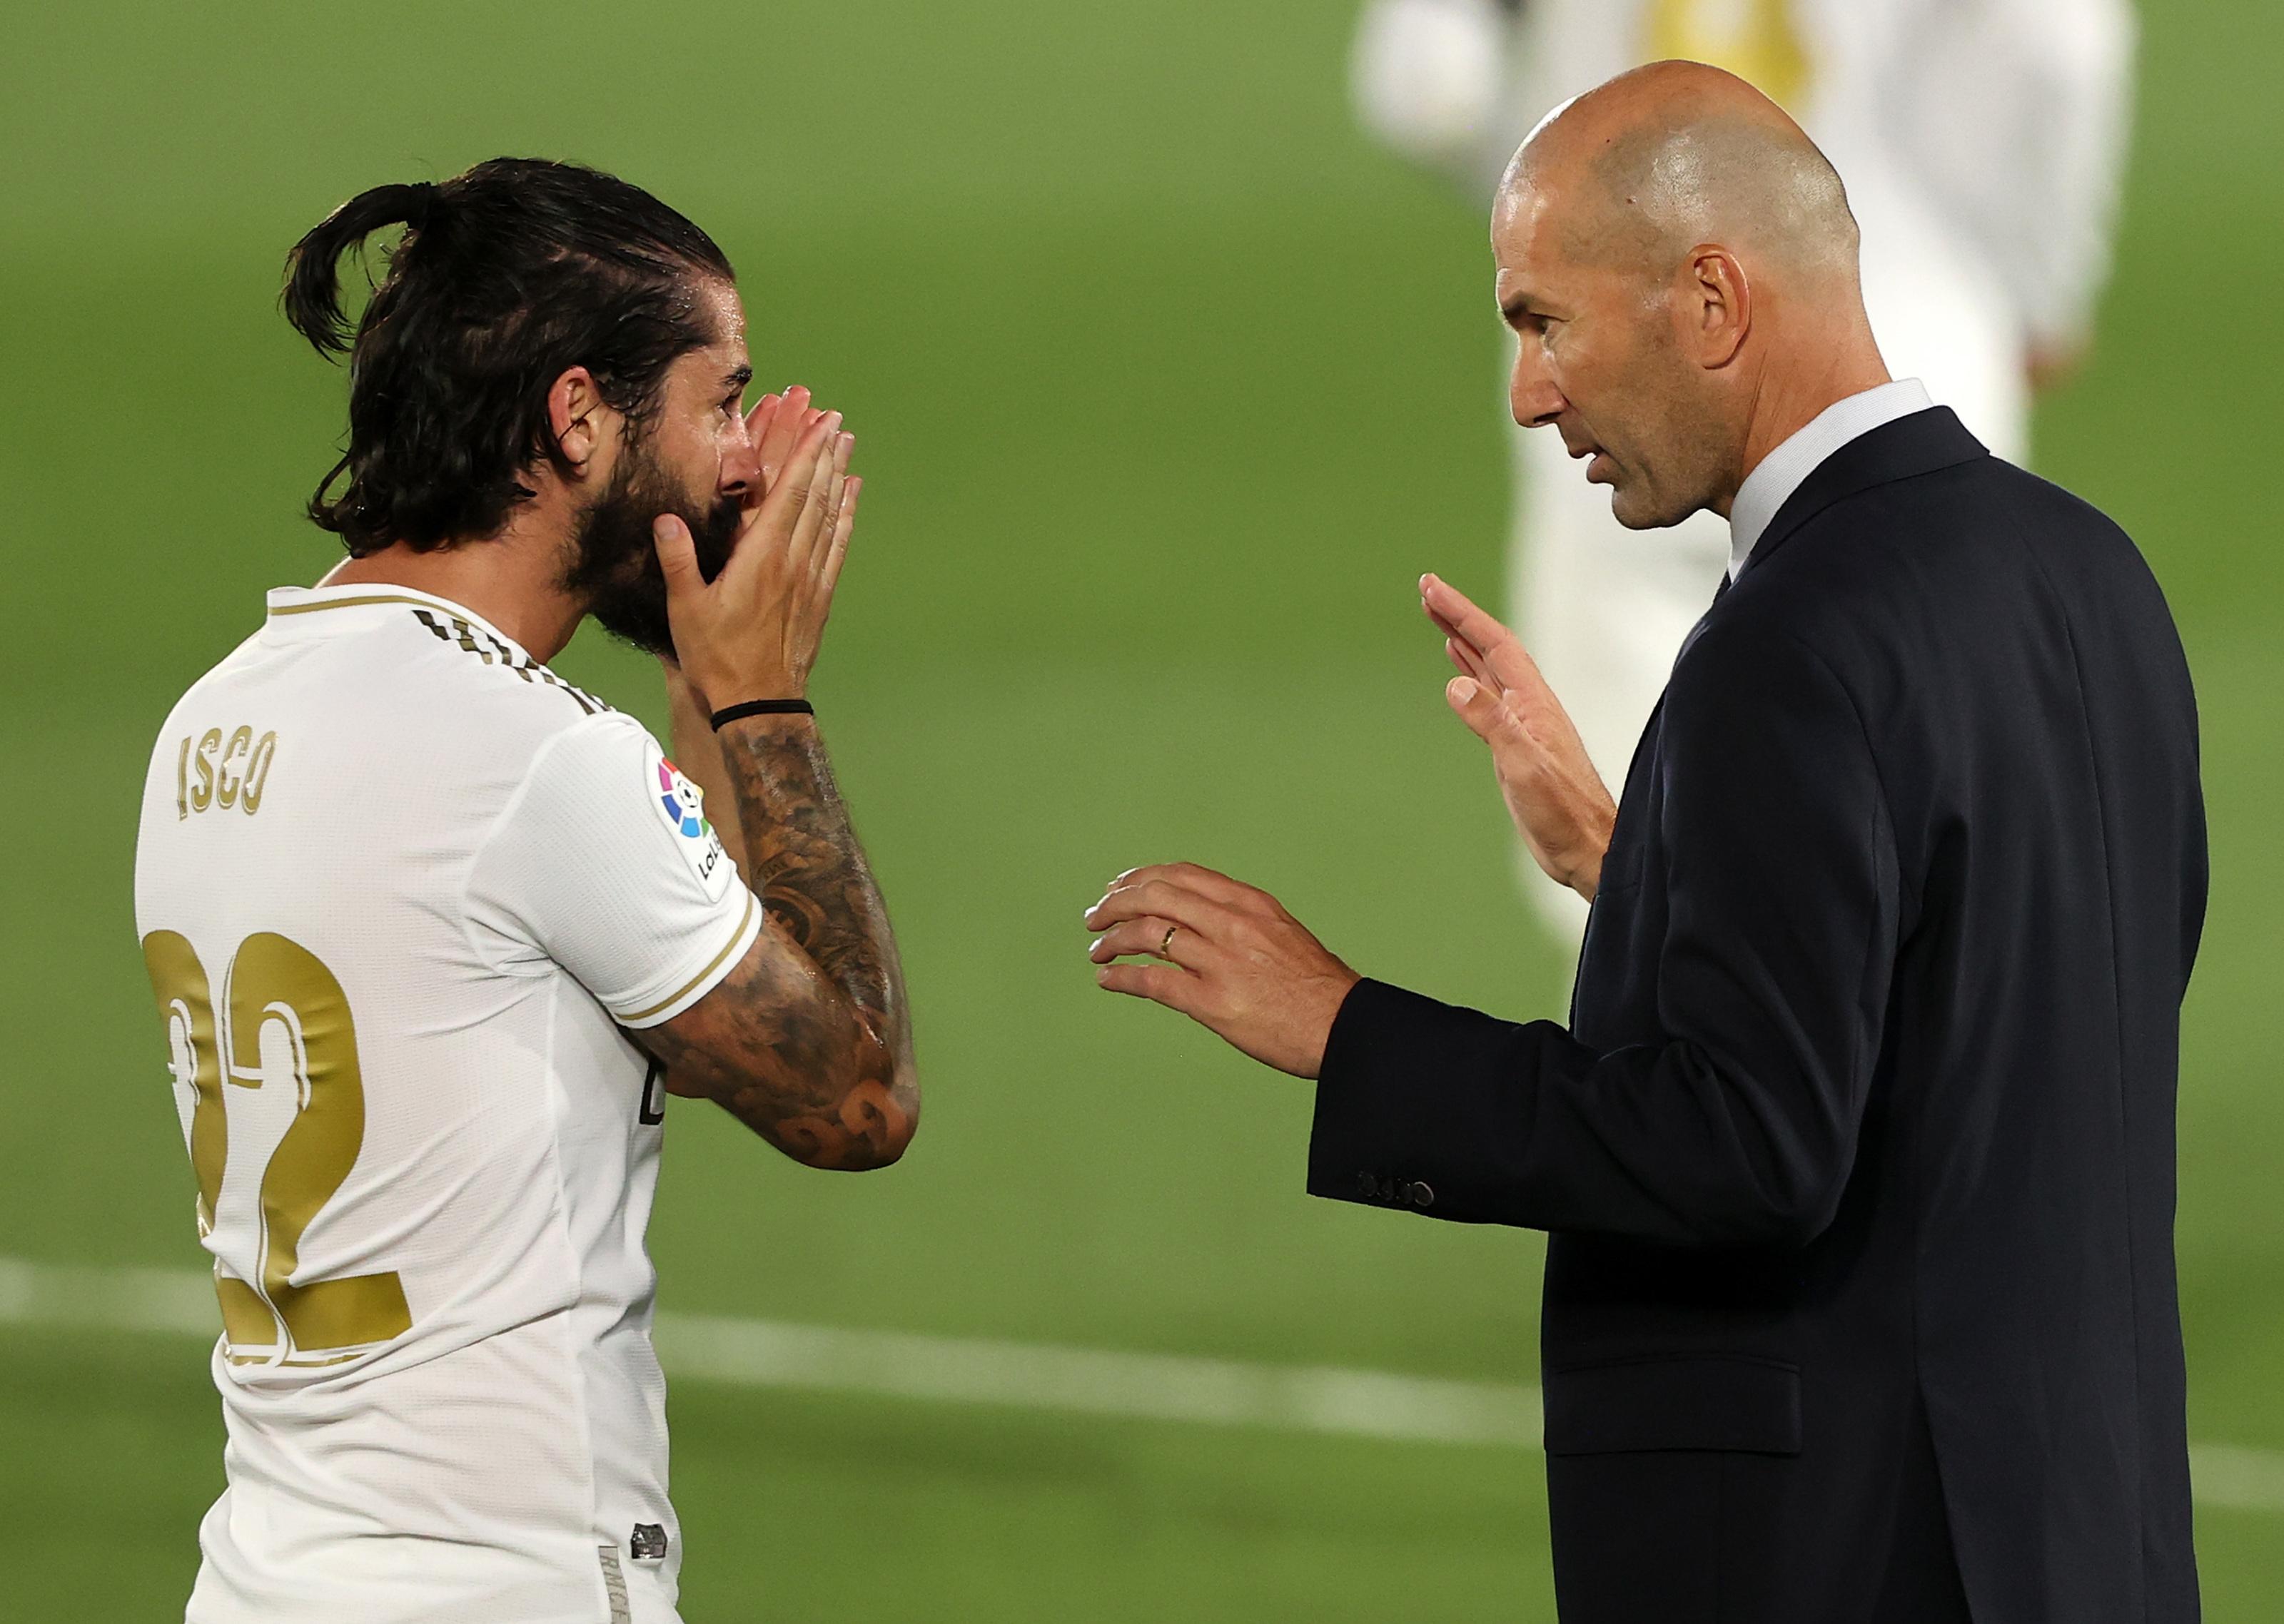 Real Madrid: Zinedine Zidane will decide the future of Isco